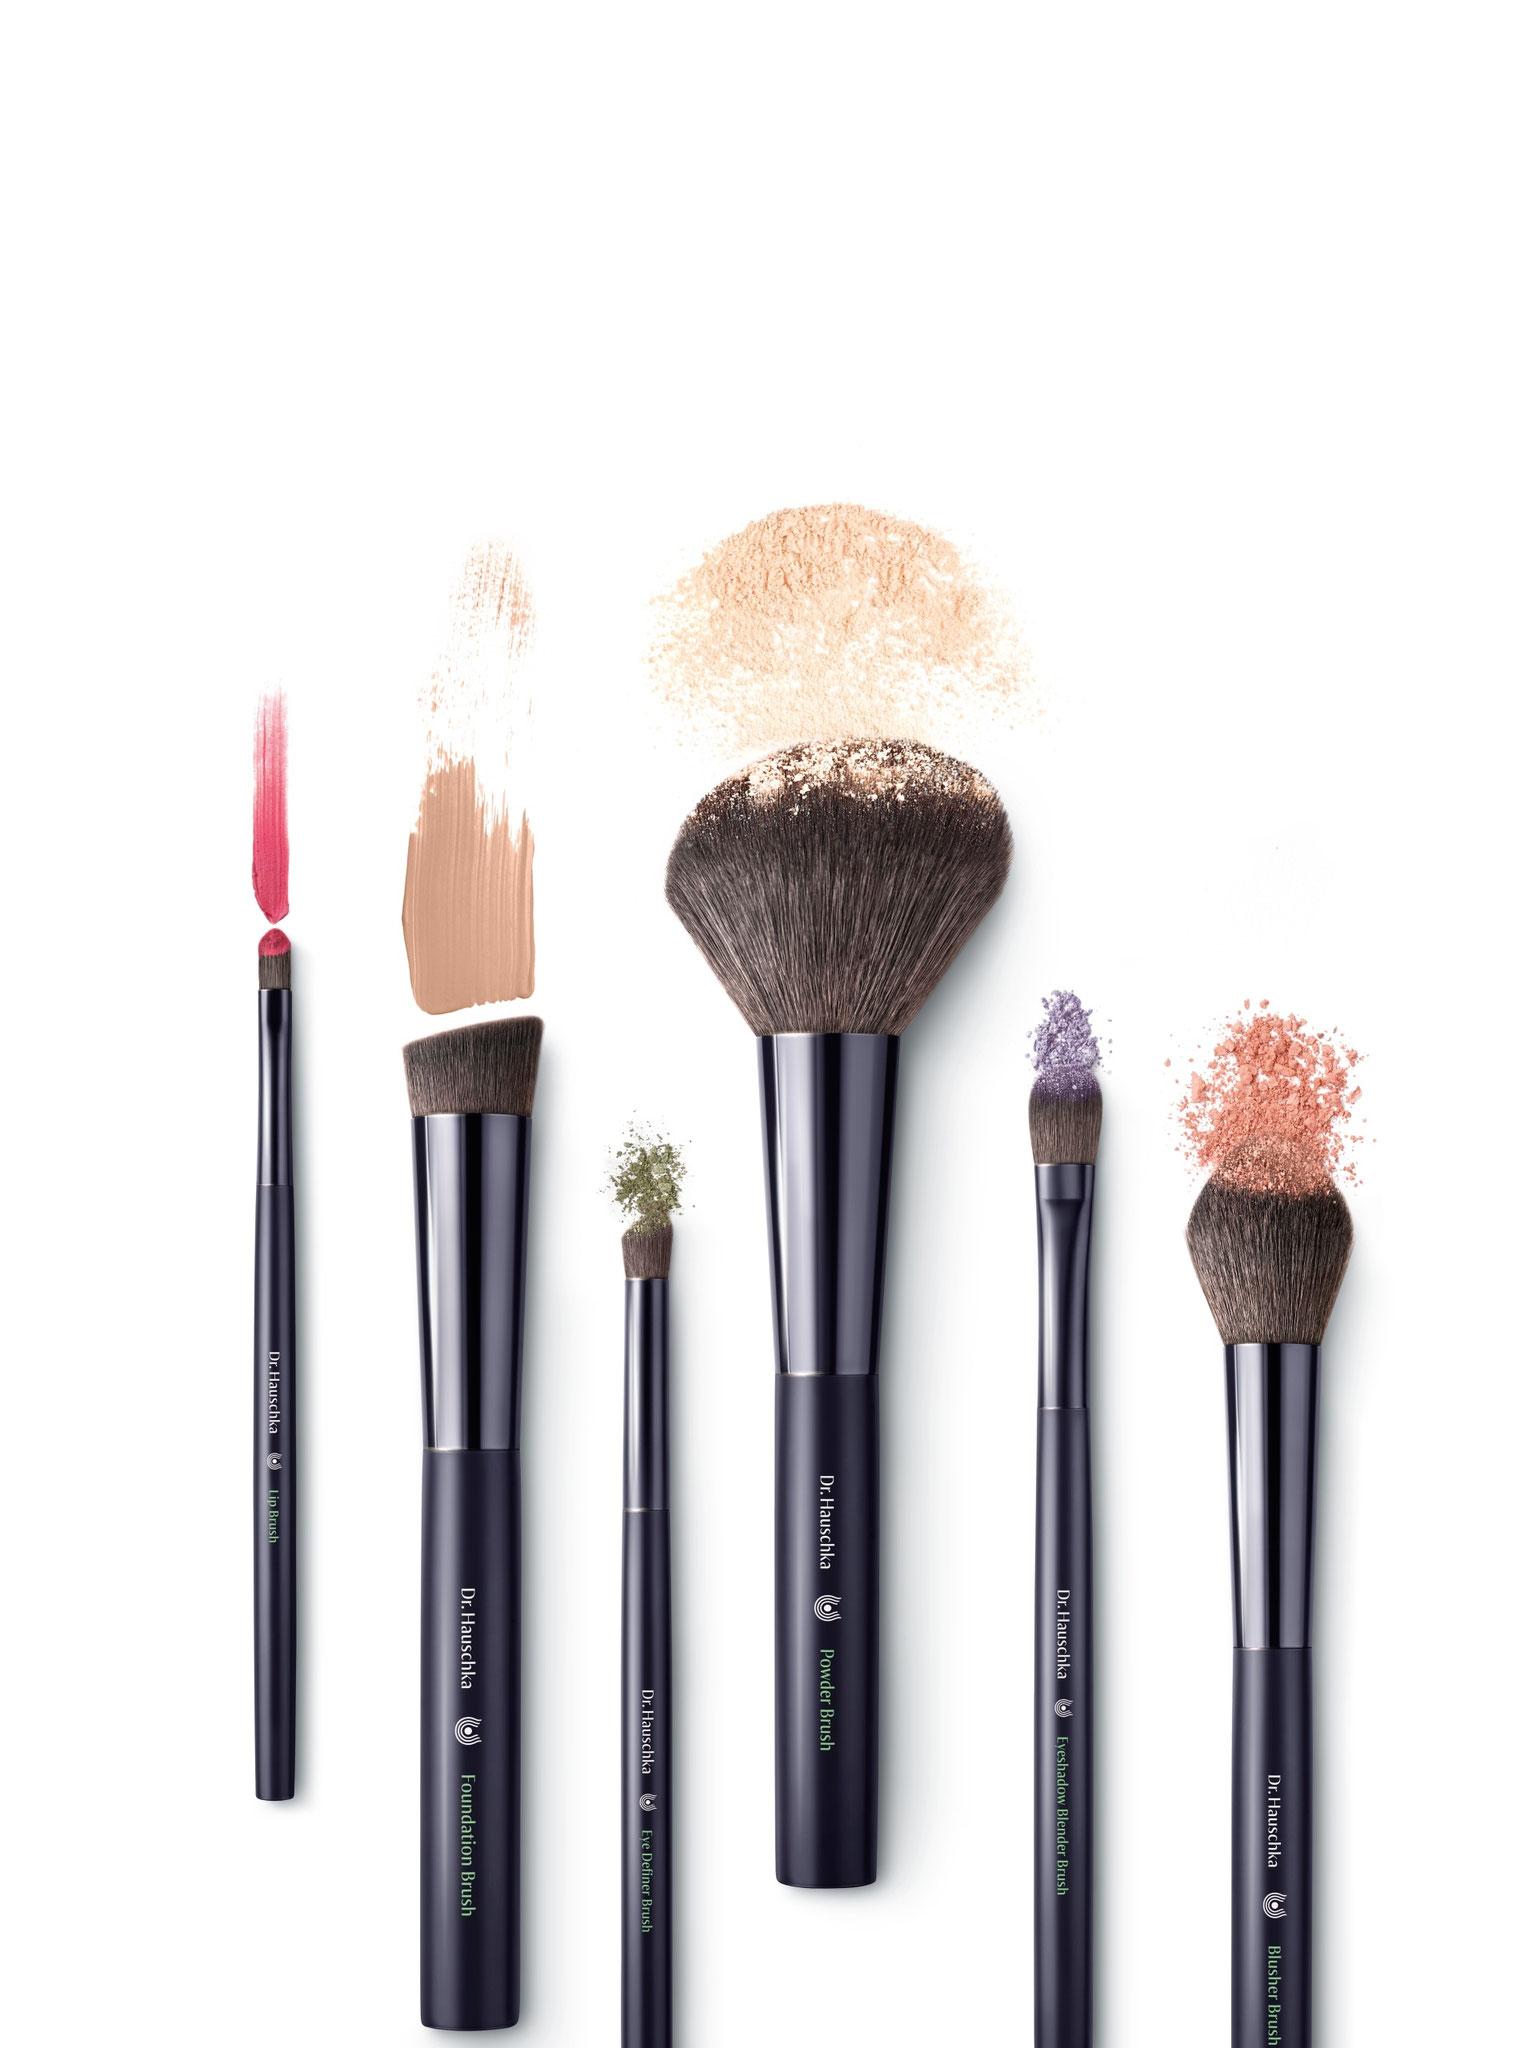 Dr.hauschka Make Up Extras